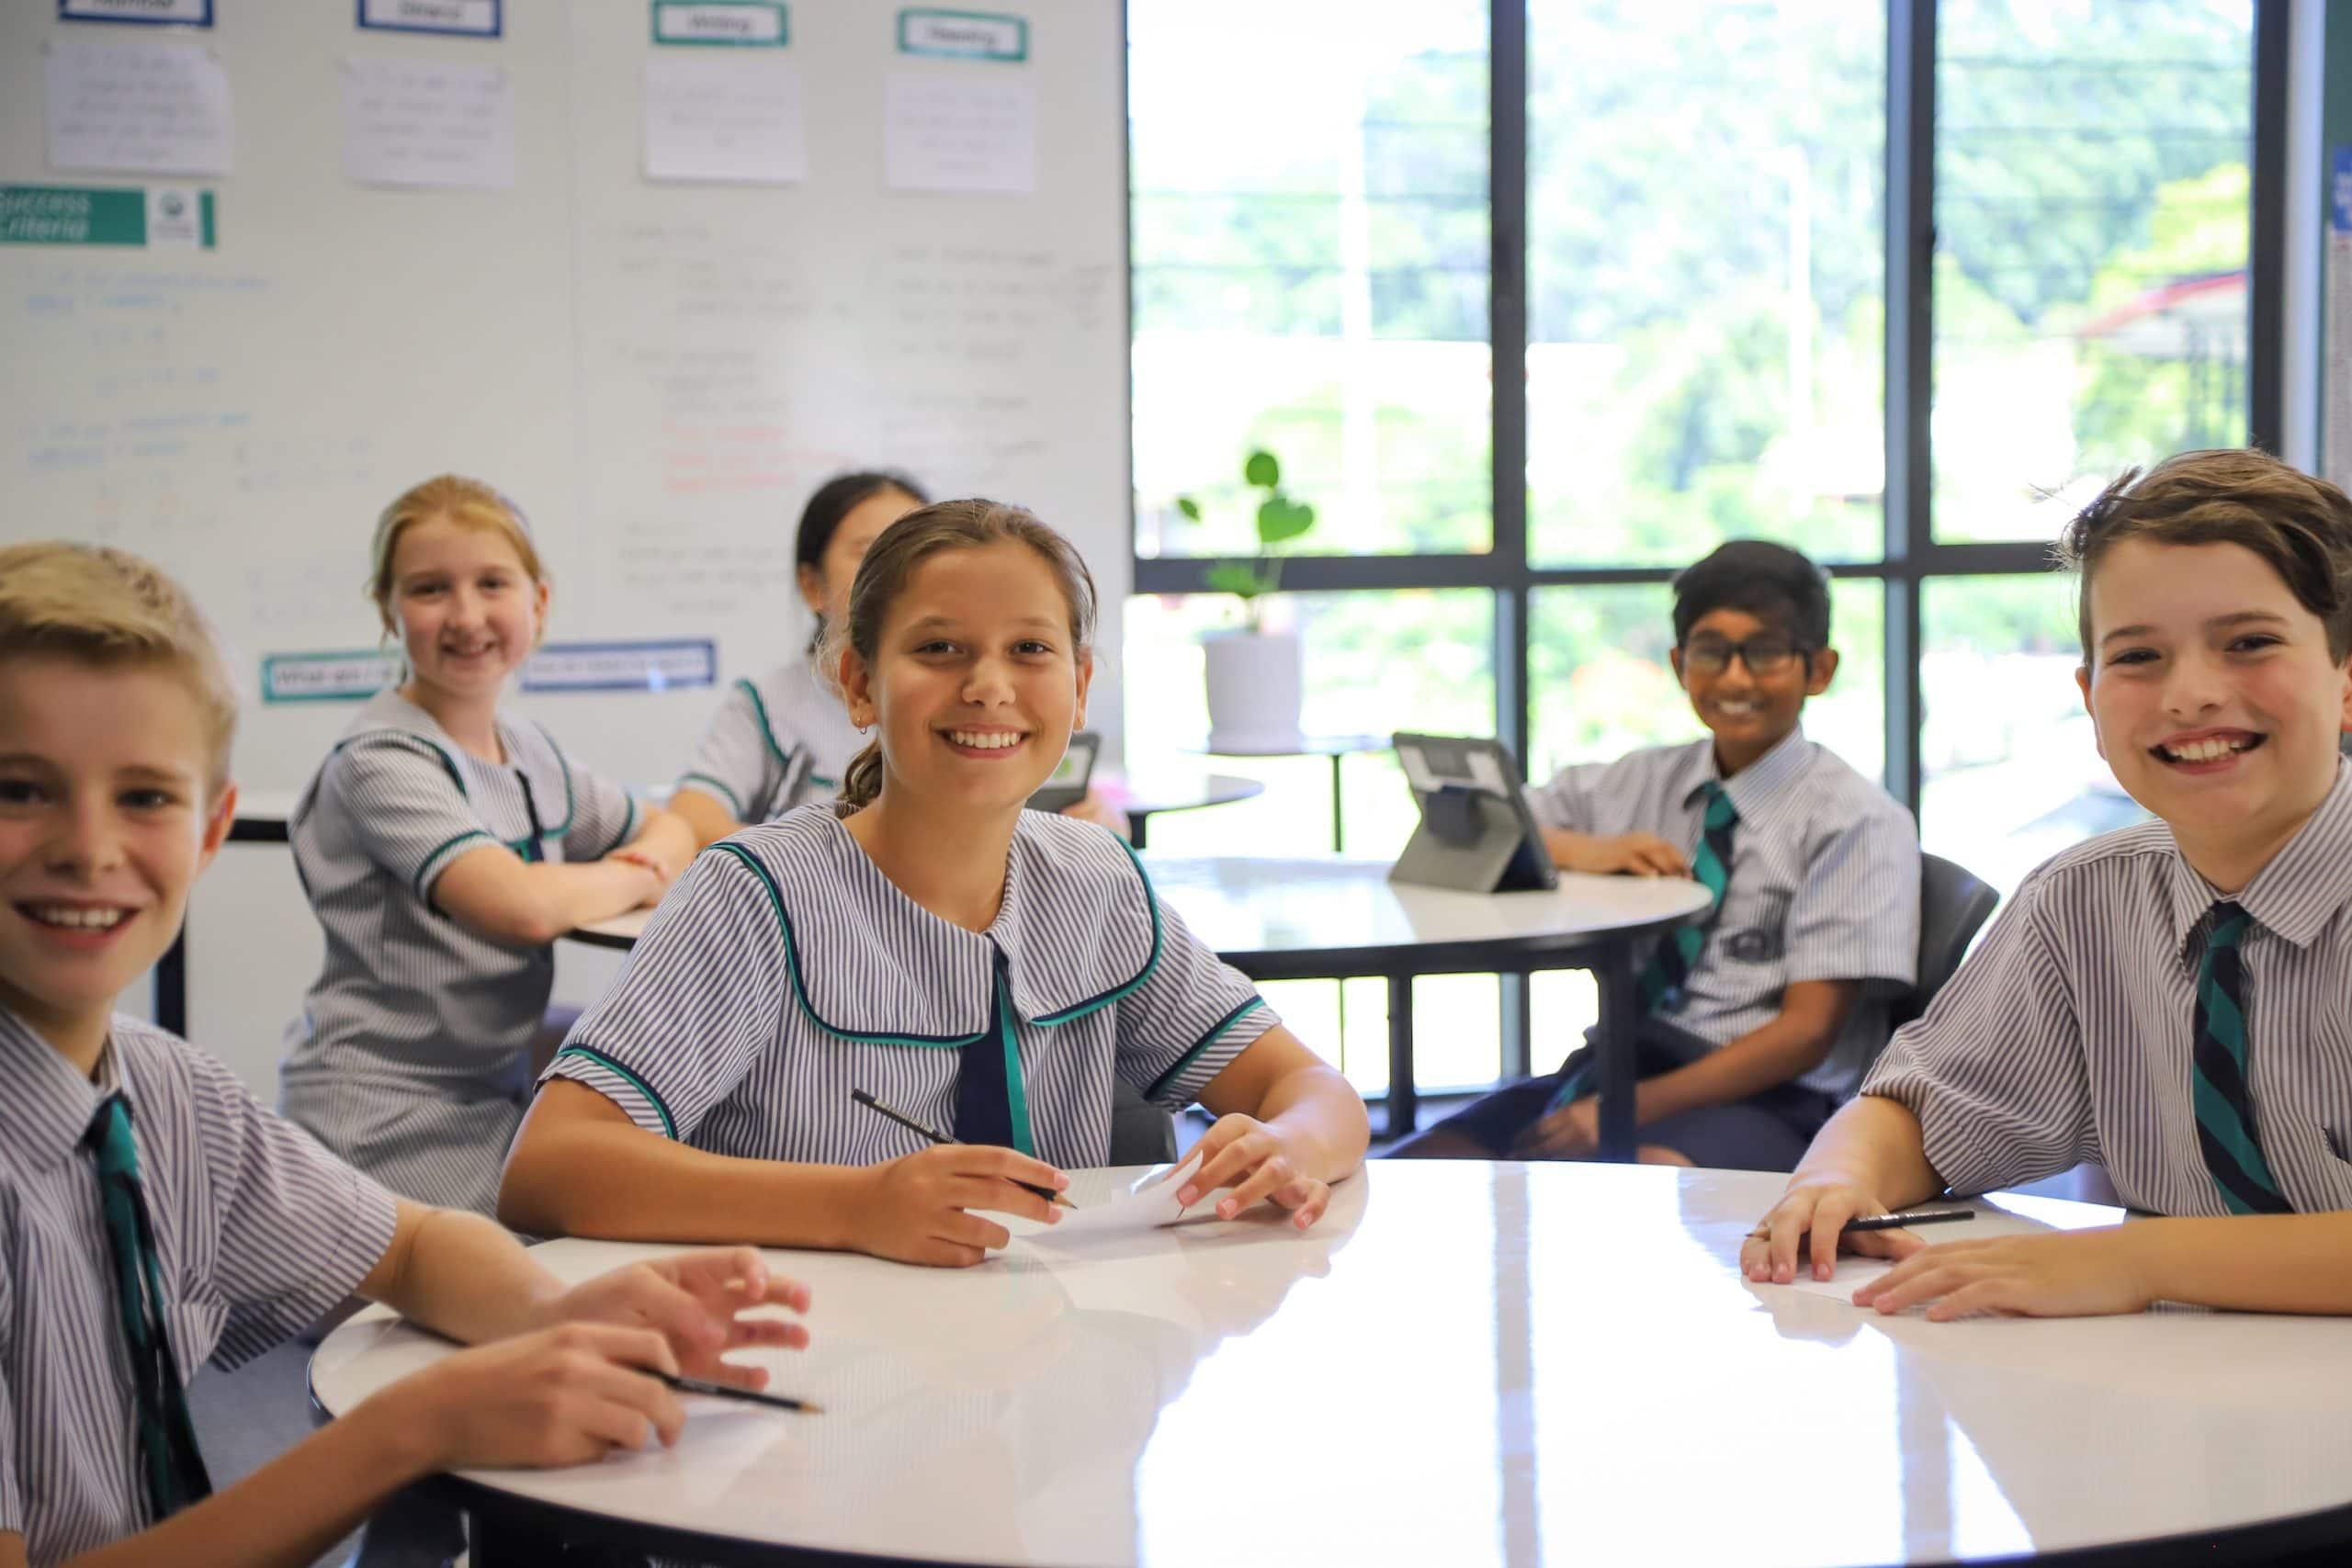 Flinders Year 6 students in new building IMG_8959